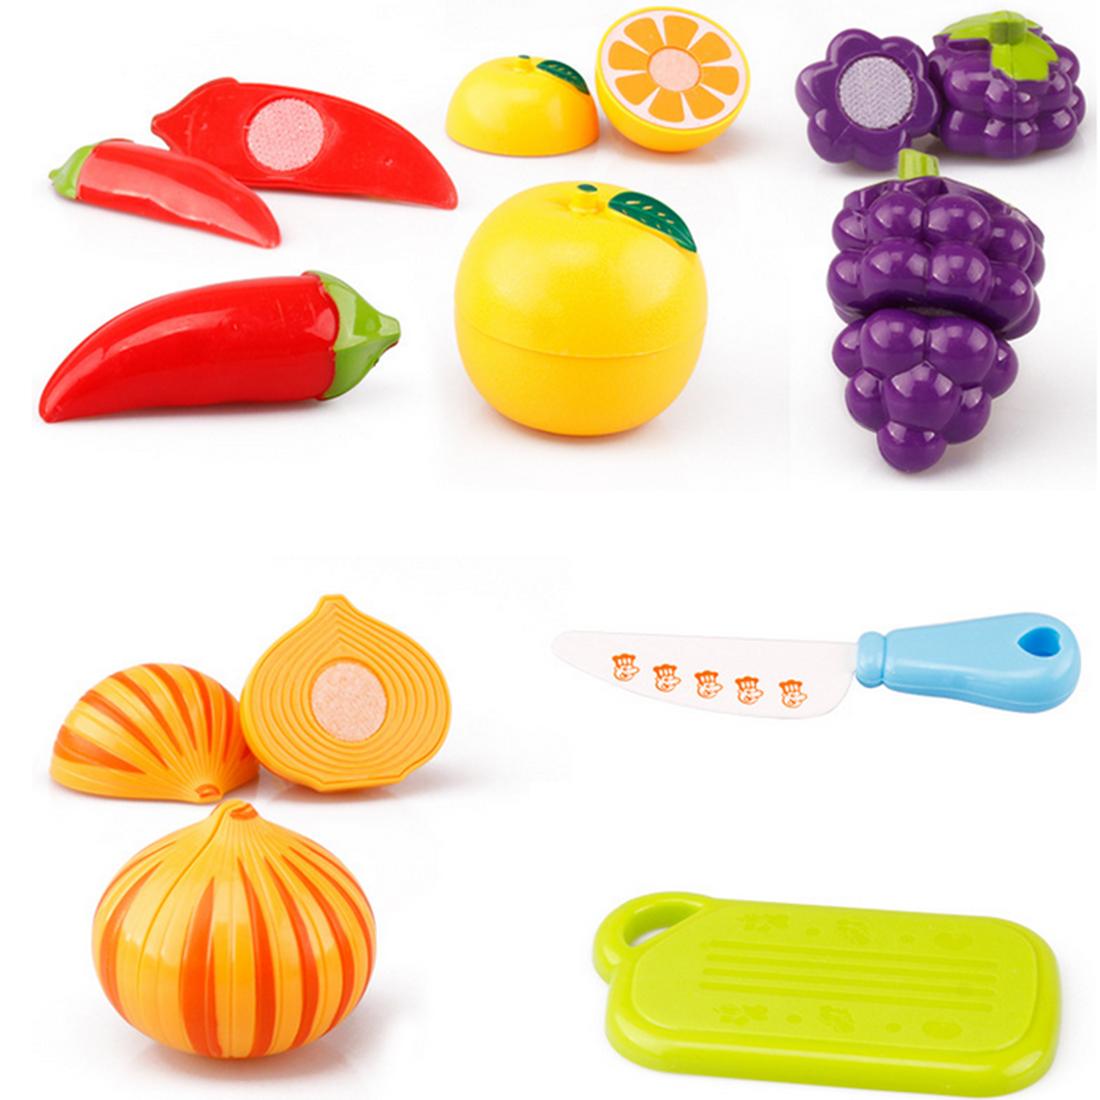 Mainan Eduka Wooden Color Blocks 40 Pcs7 Daftar Harga Terkini Dan Otoys Balok Pa 330196 Fun Character Kreatifitas Barang Yang Anda Dapat Dalam Kotak Produk